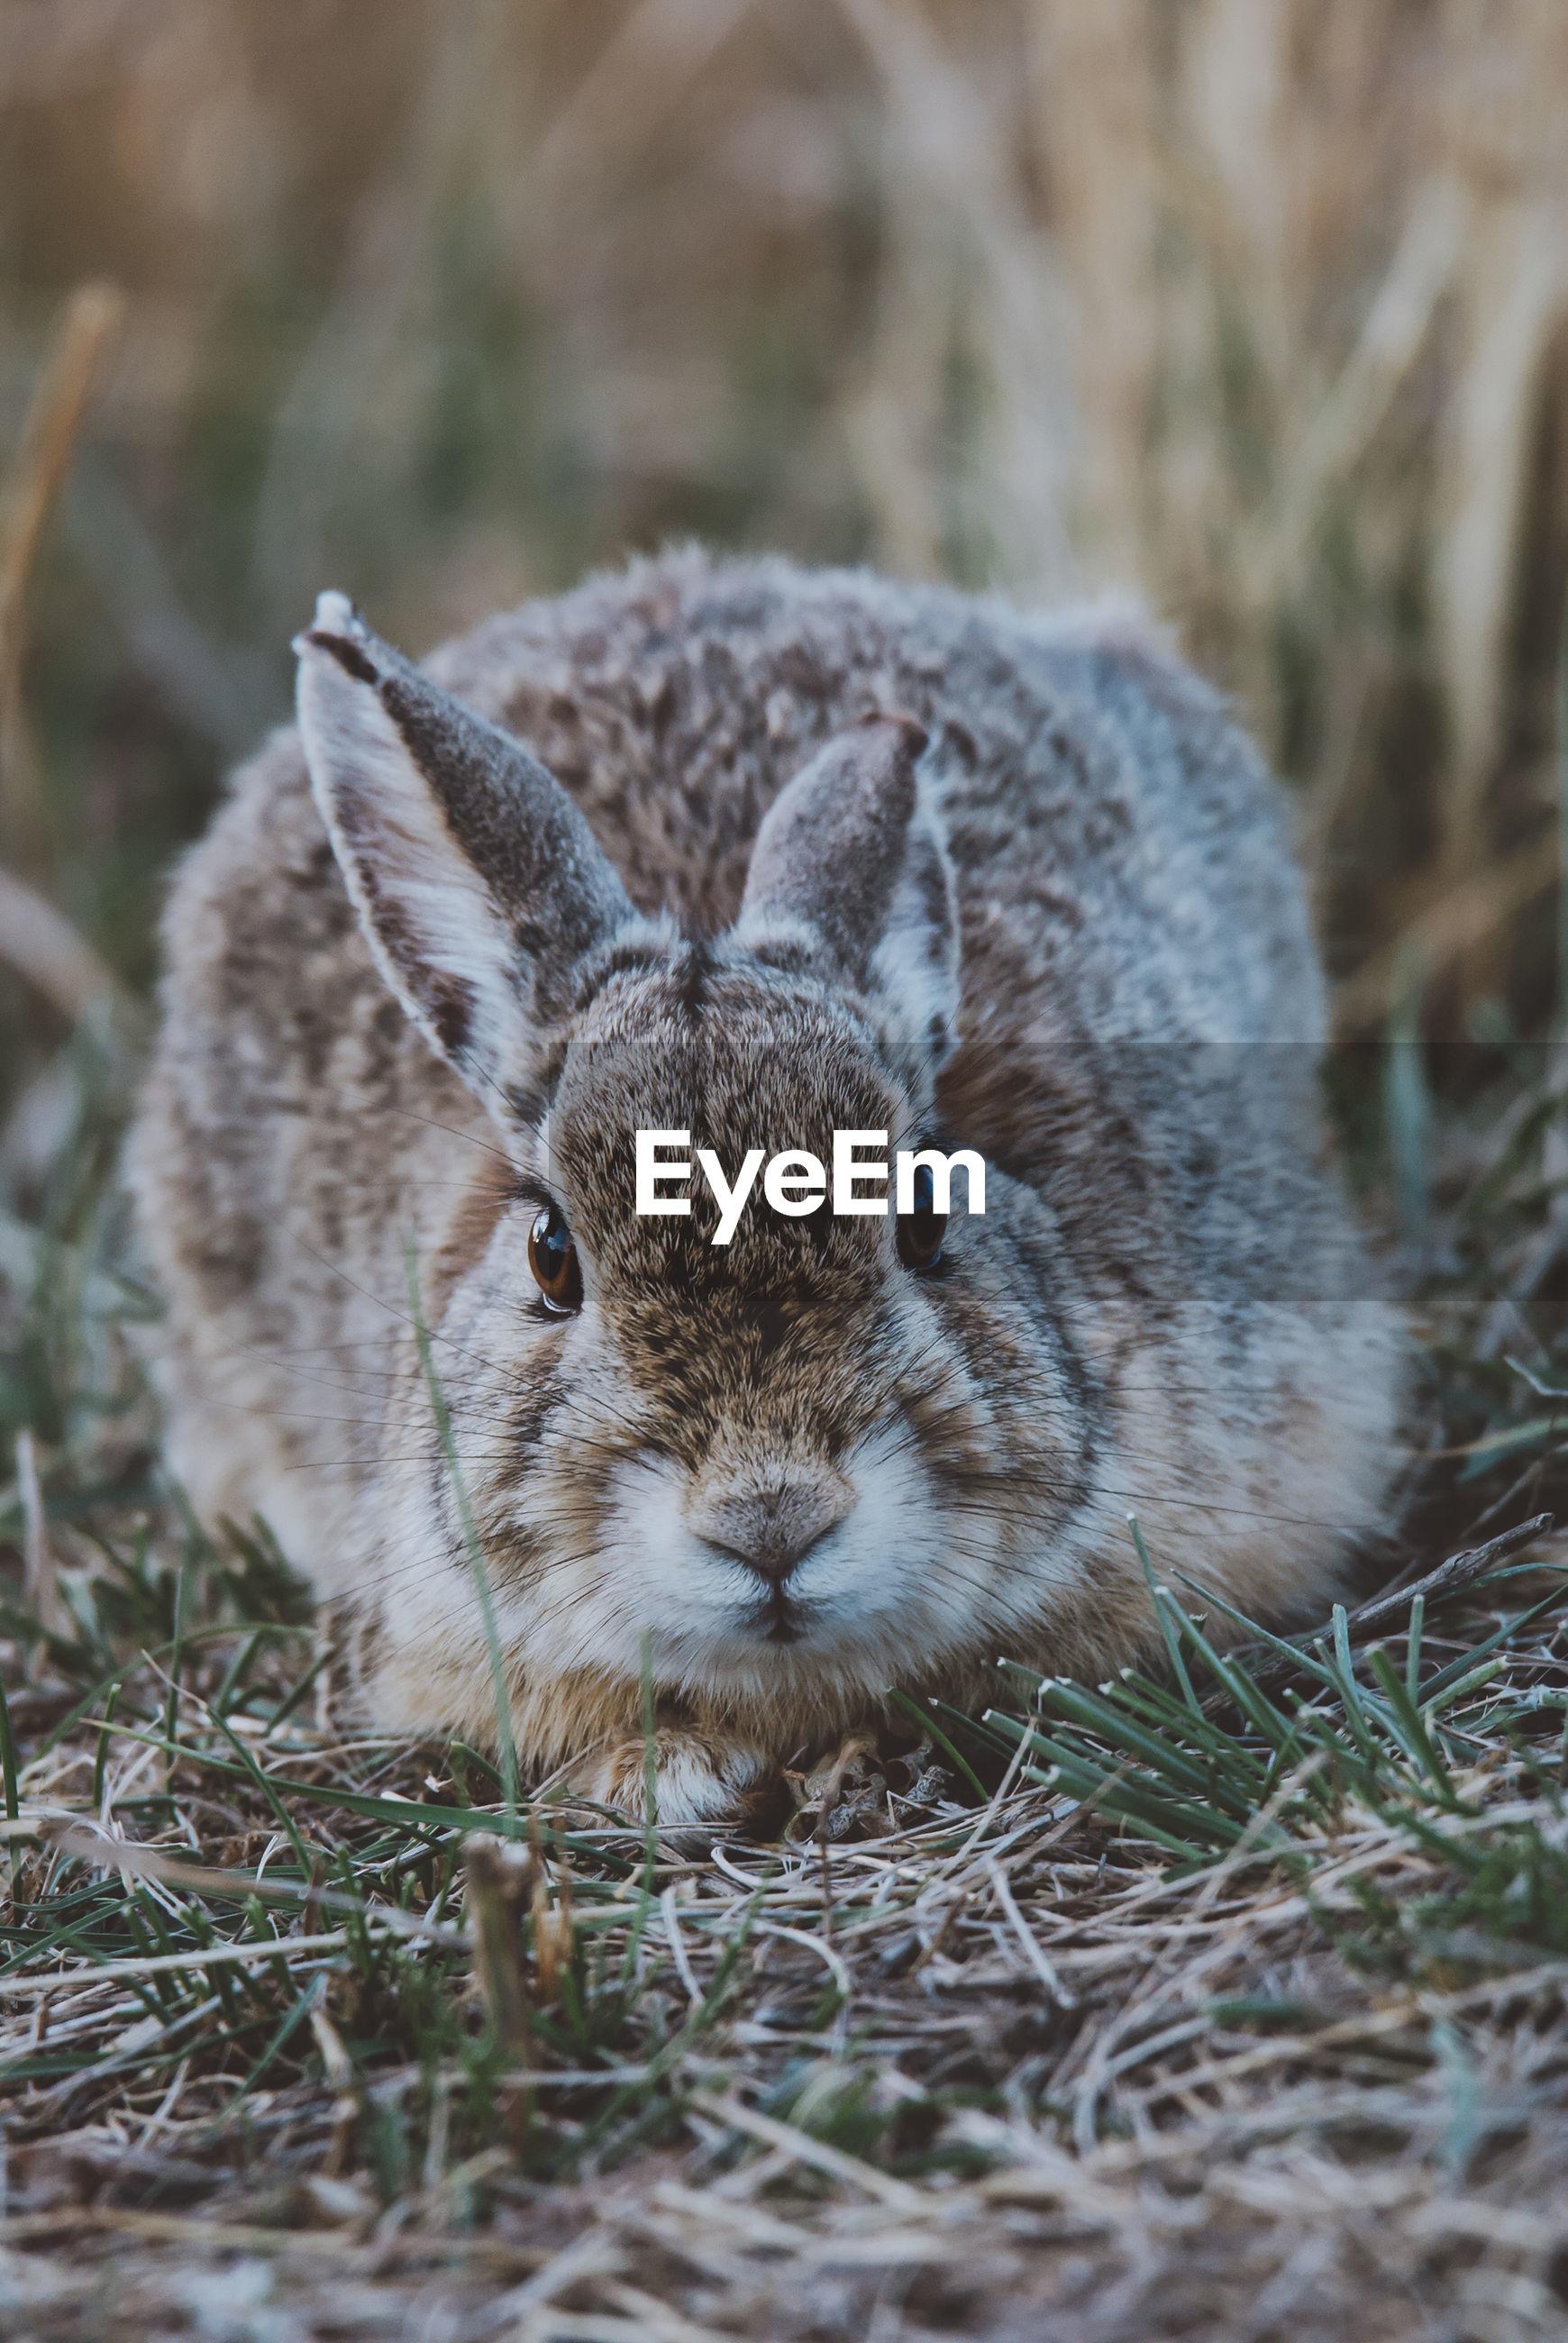 Close of rabbit on field